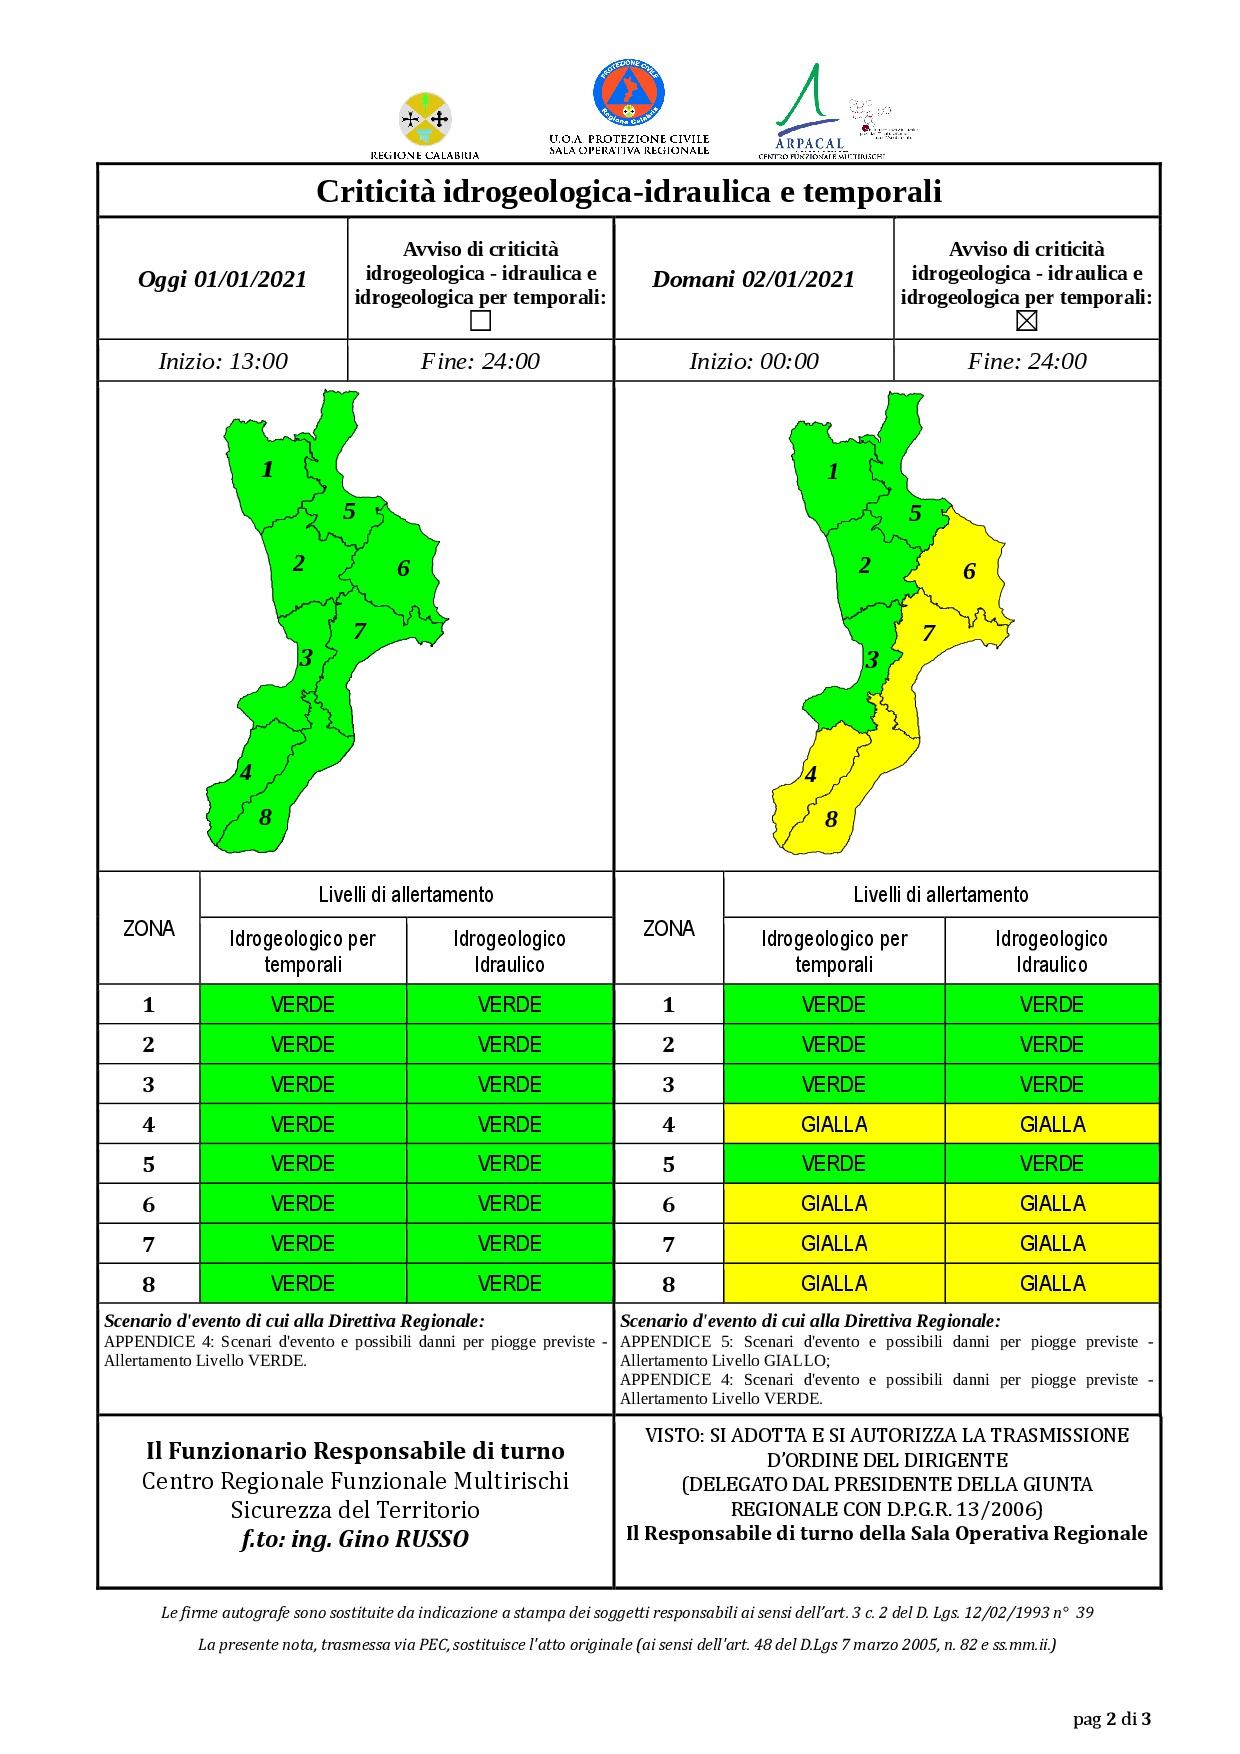 Criticità idrogeologica-idraulica e temporali in Calabria 01-01-2021